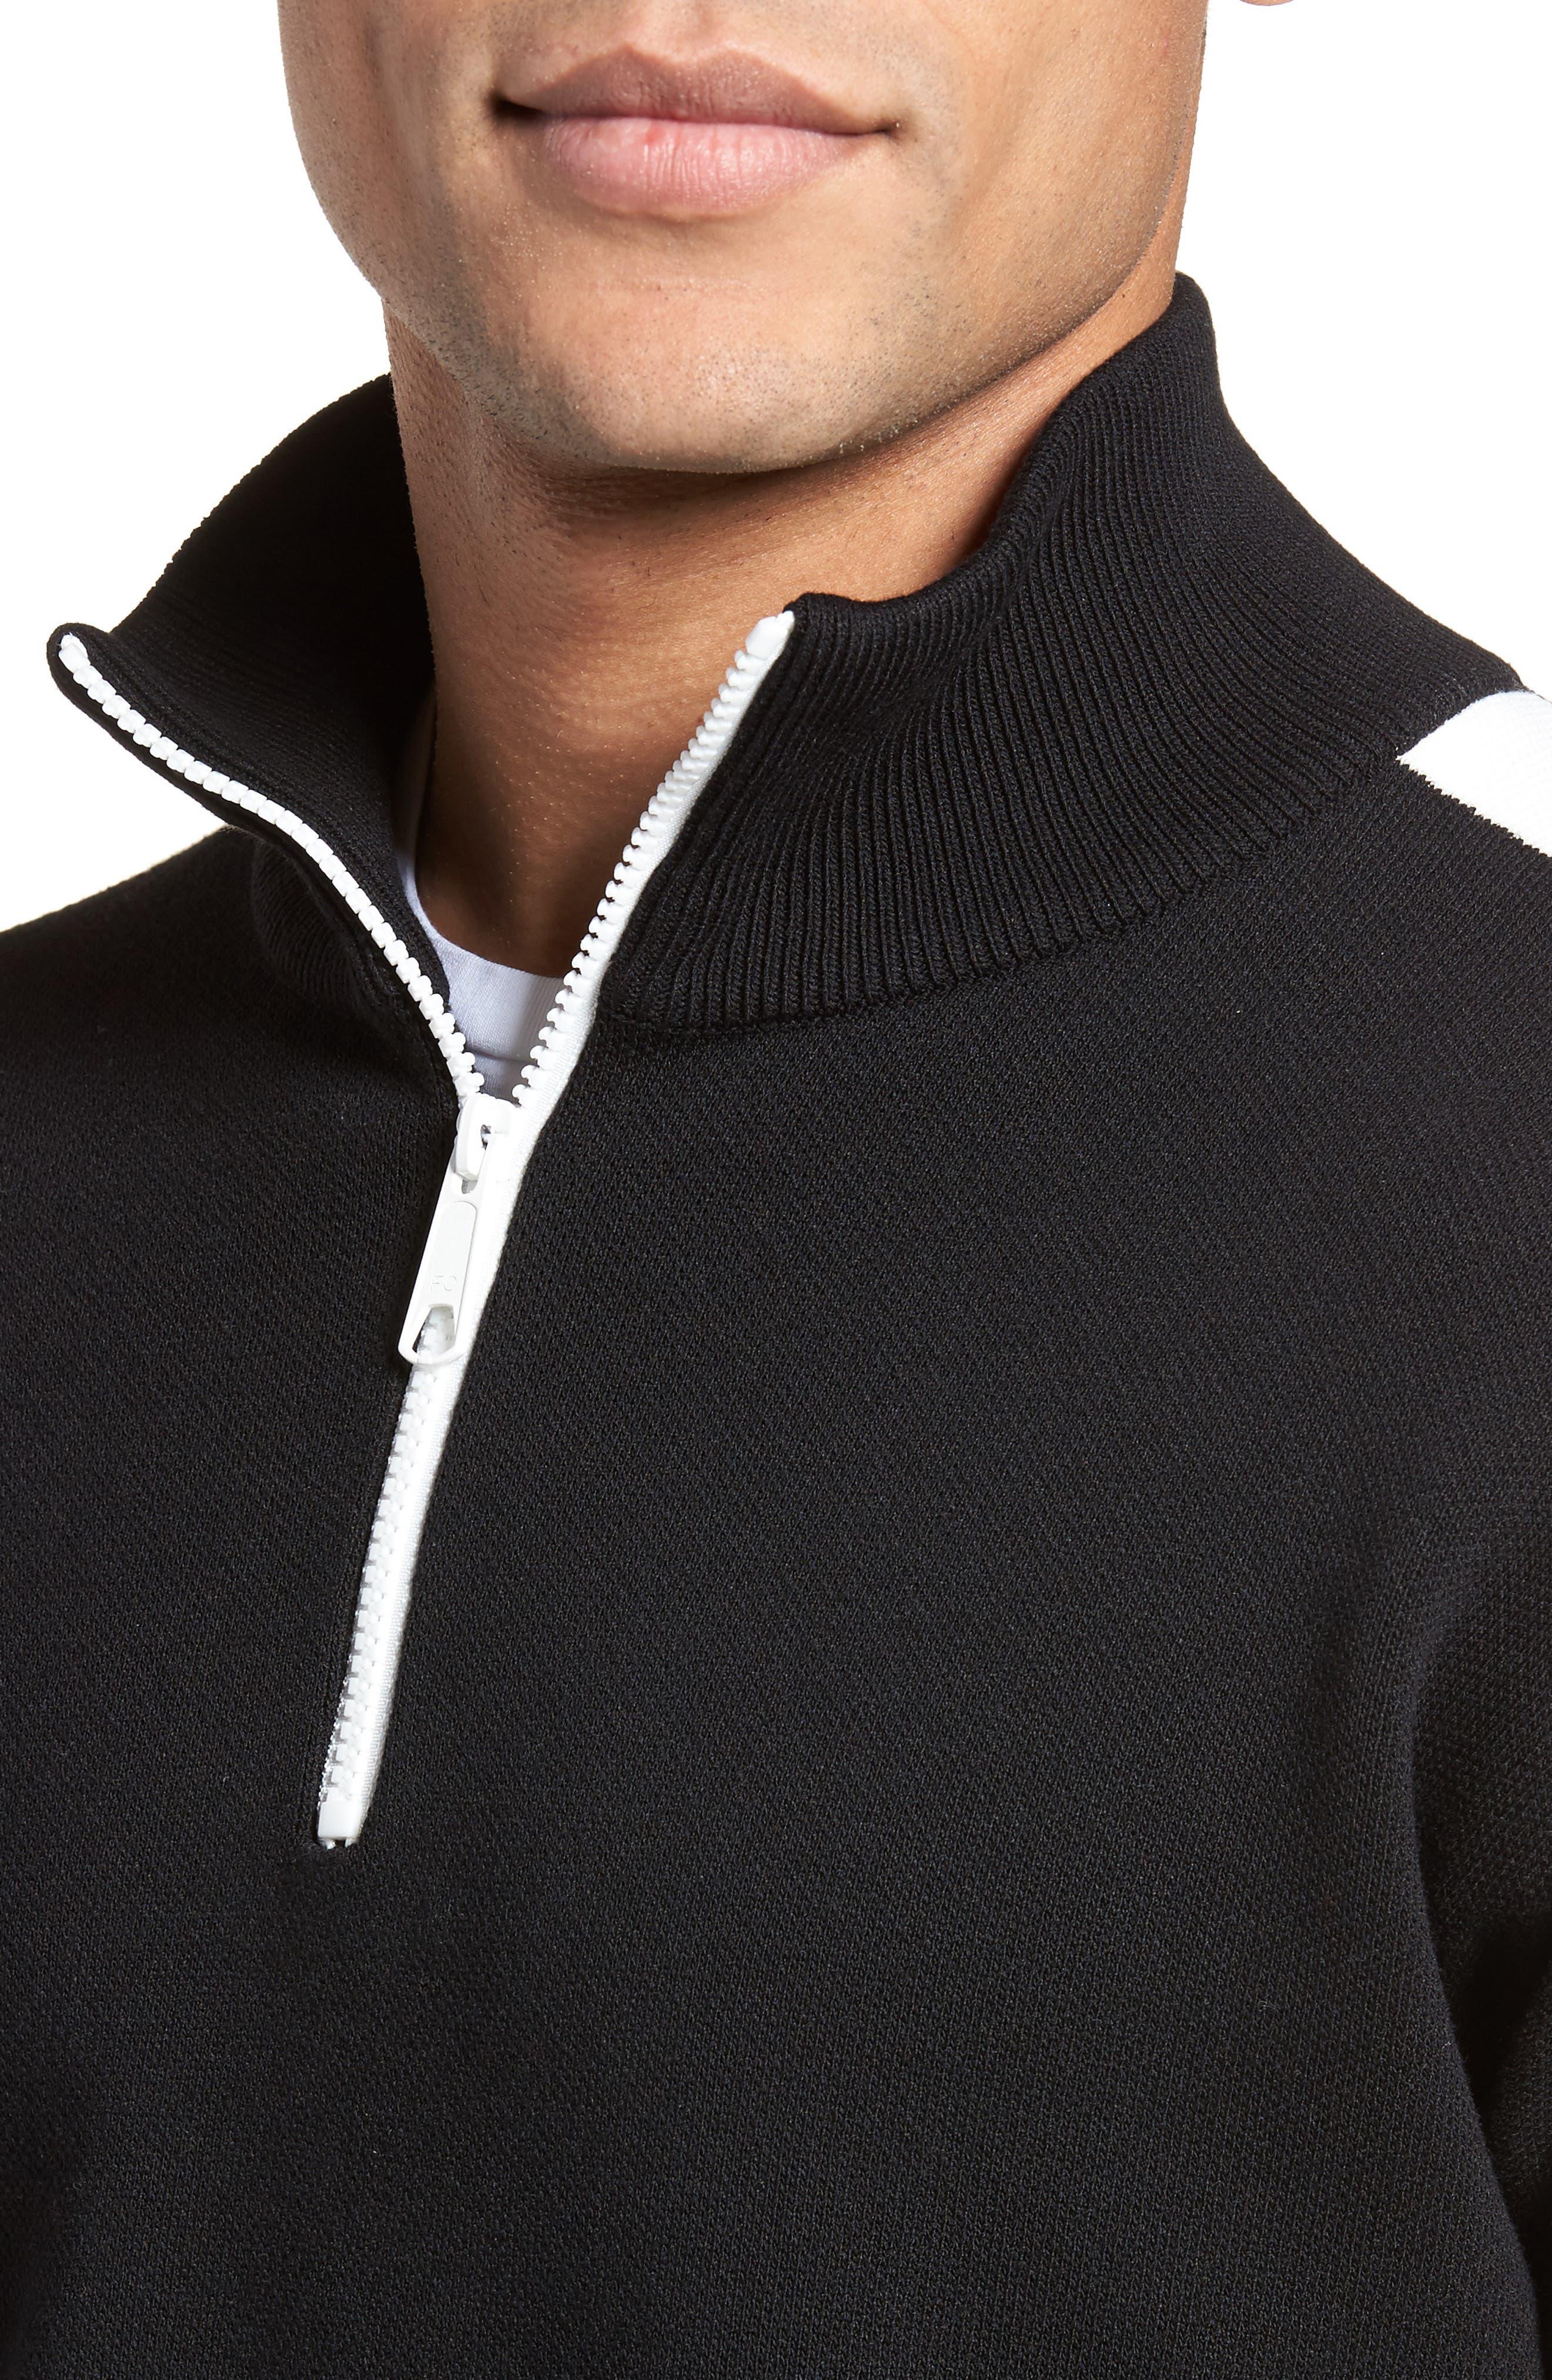 Lakra Regular Fit Half Zip Pullover,                             Alternate thumbnail 4, color,                             Black/Milk/Black